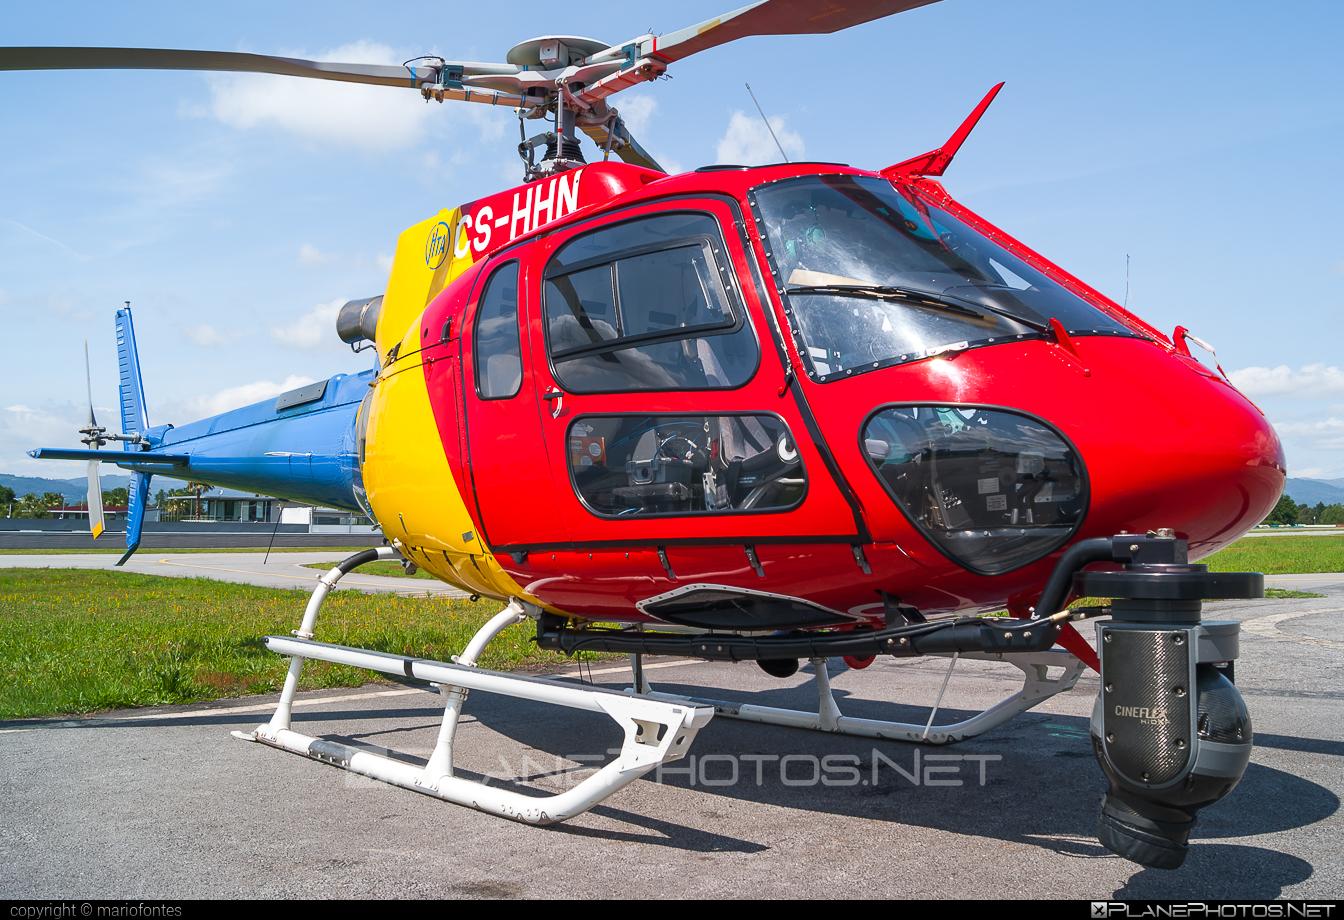 Eurocopter AS350 B3 Ecureuil - CS-HHN operated by HTA Helicópteros #eurocopter #htahelicopteros